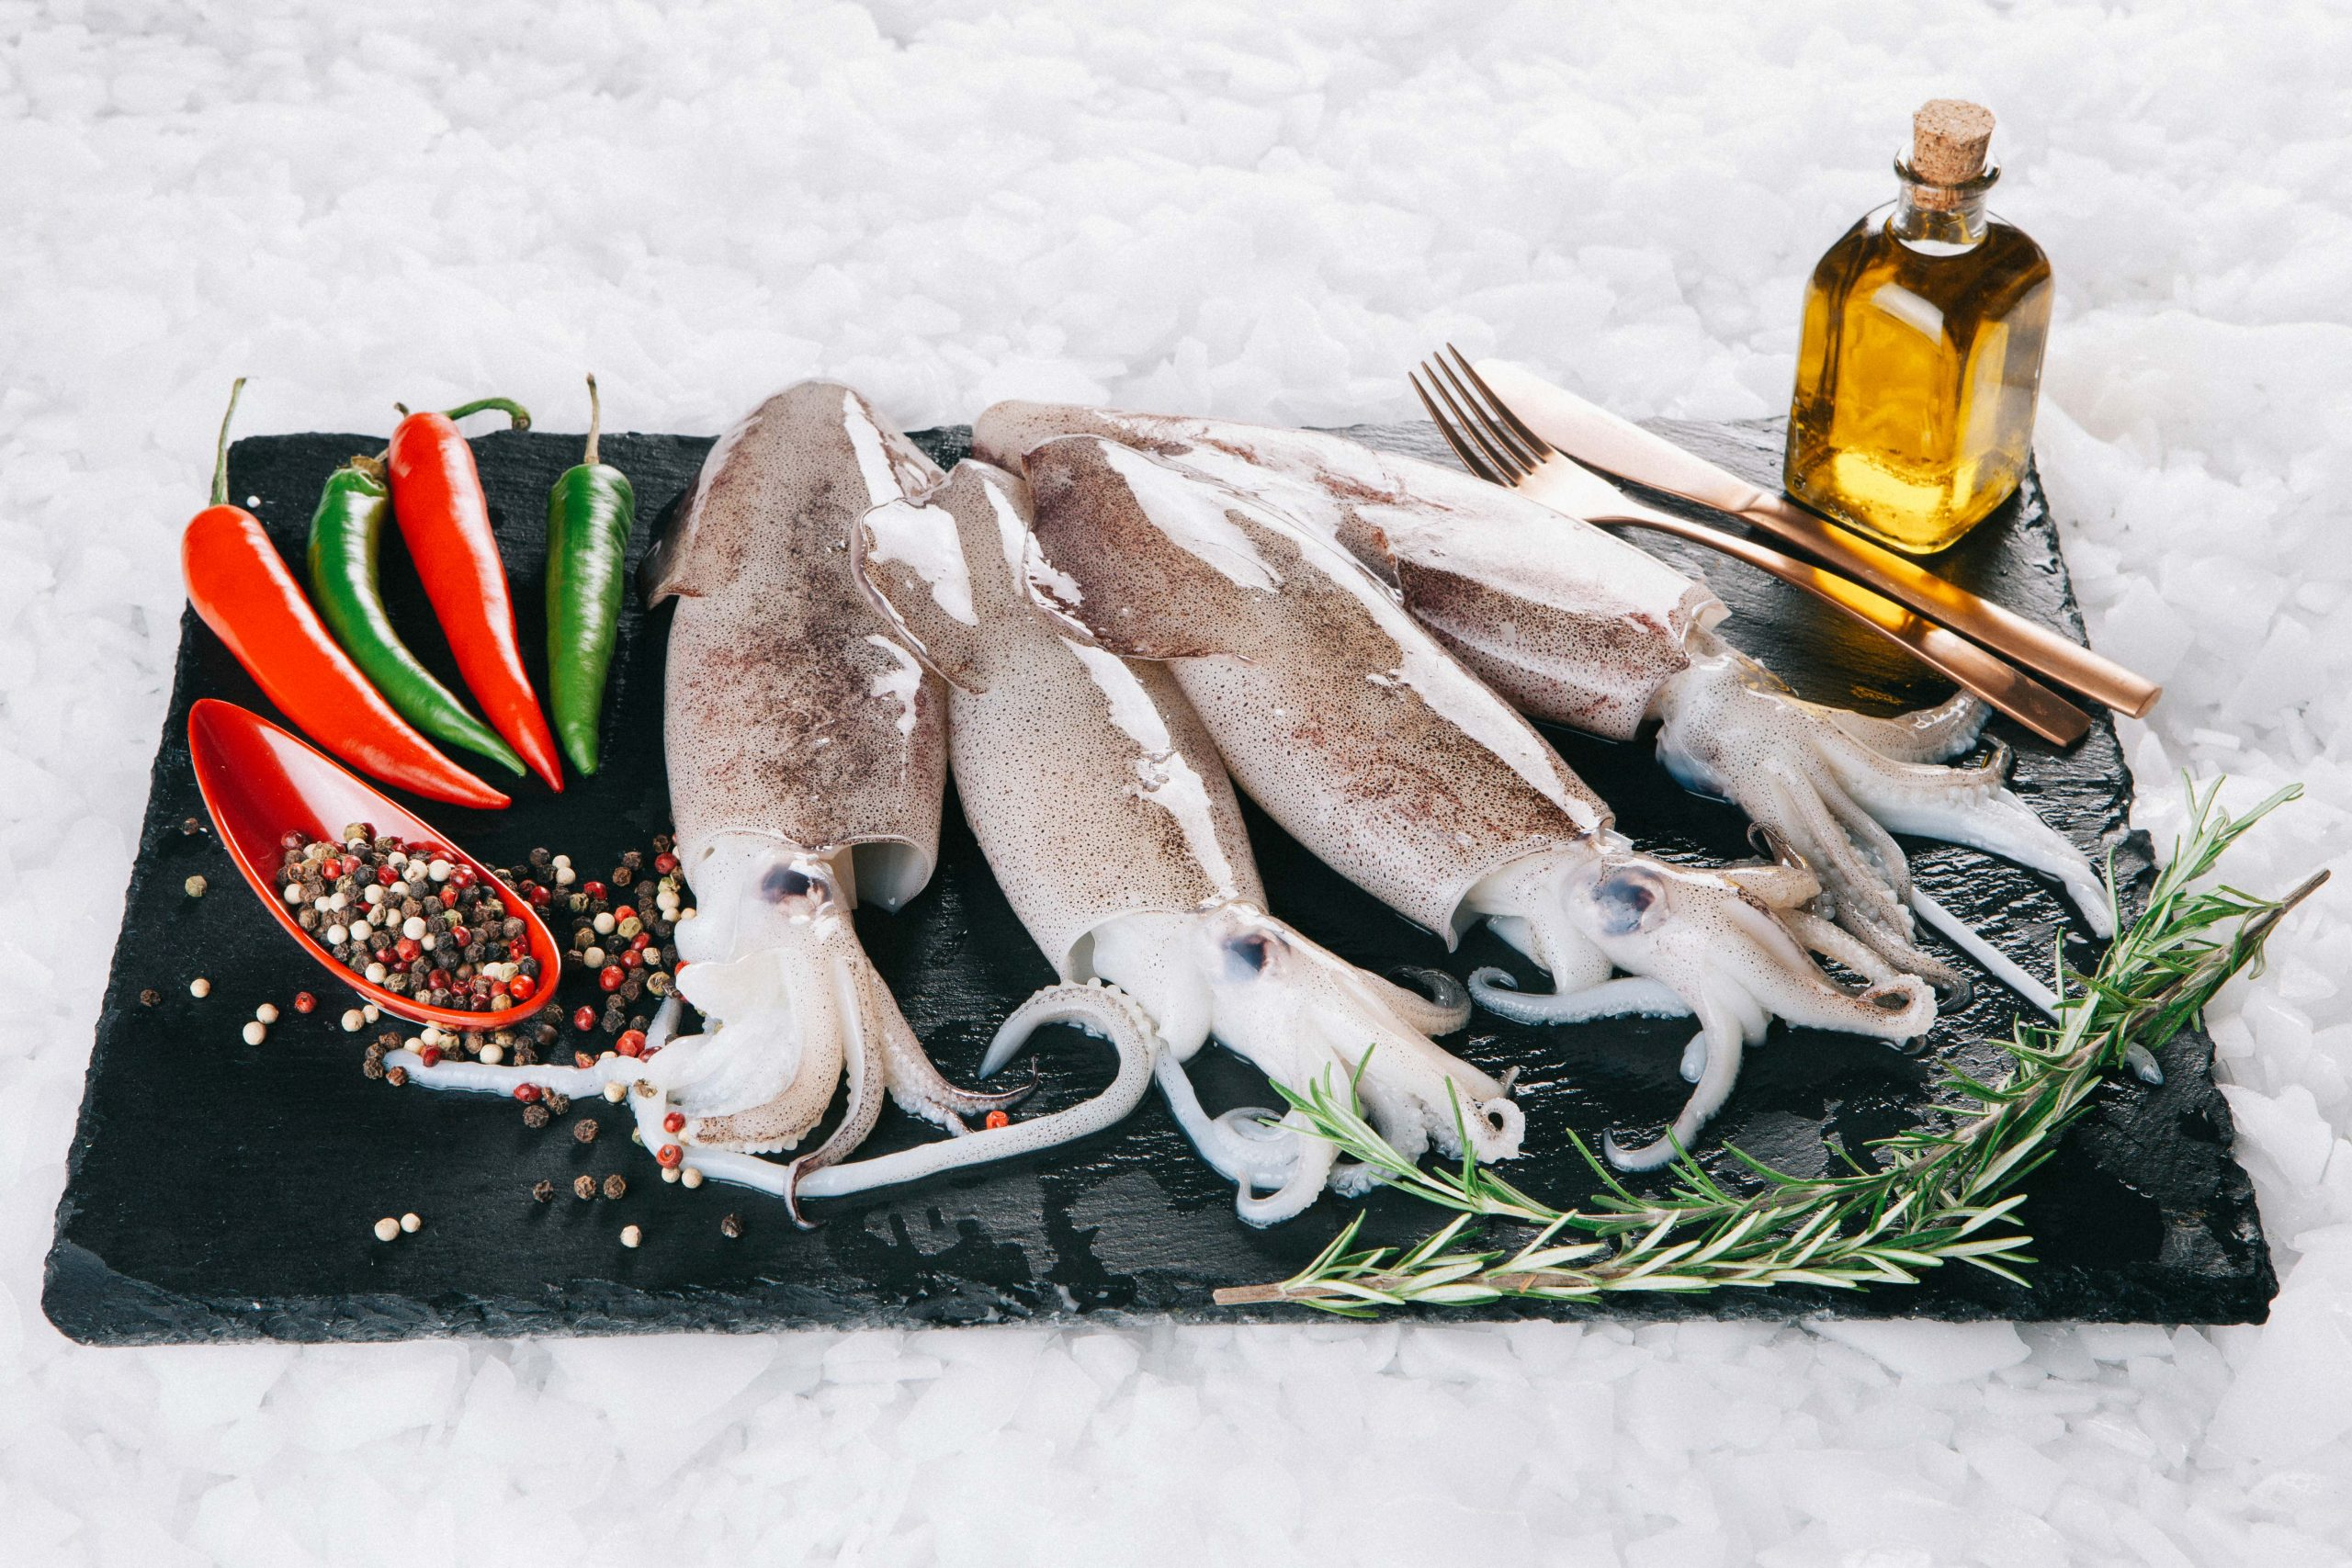 Super Fish Καλαμαρι Γνησιο Ινδιας